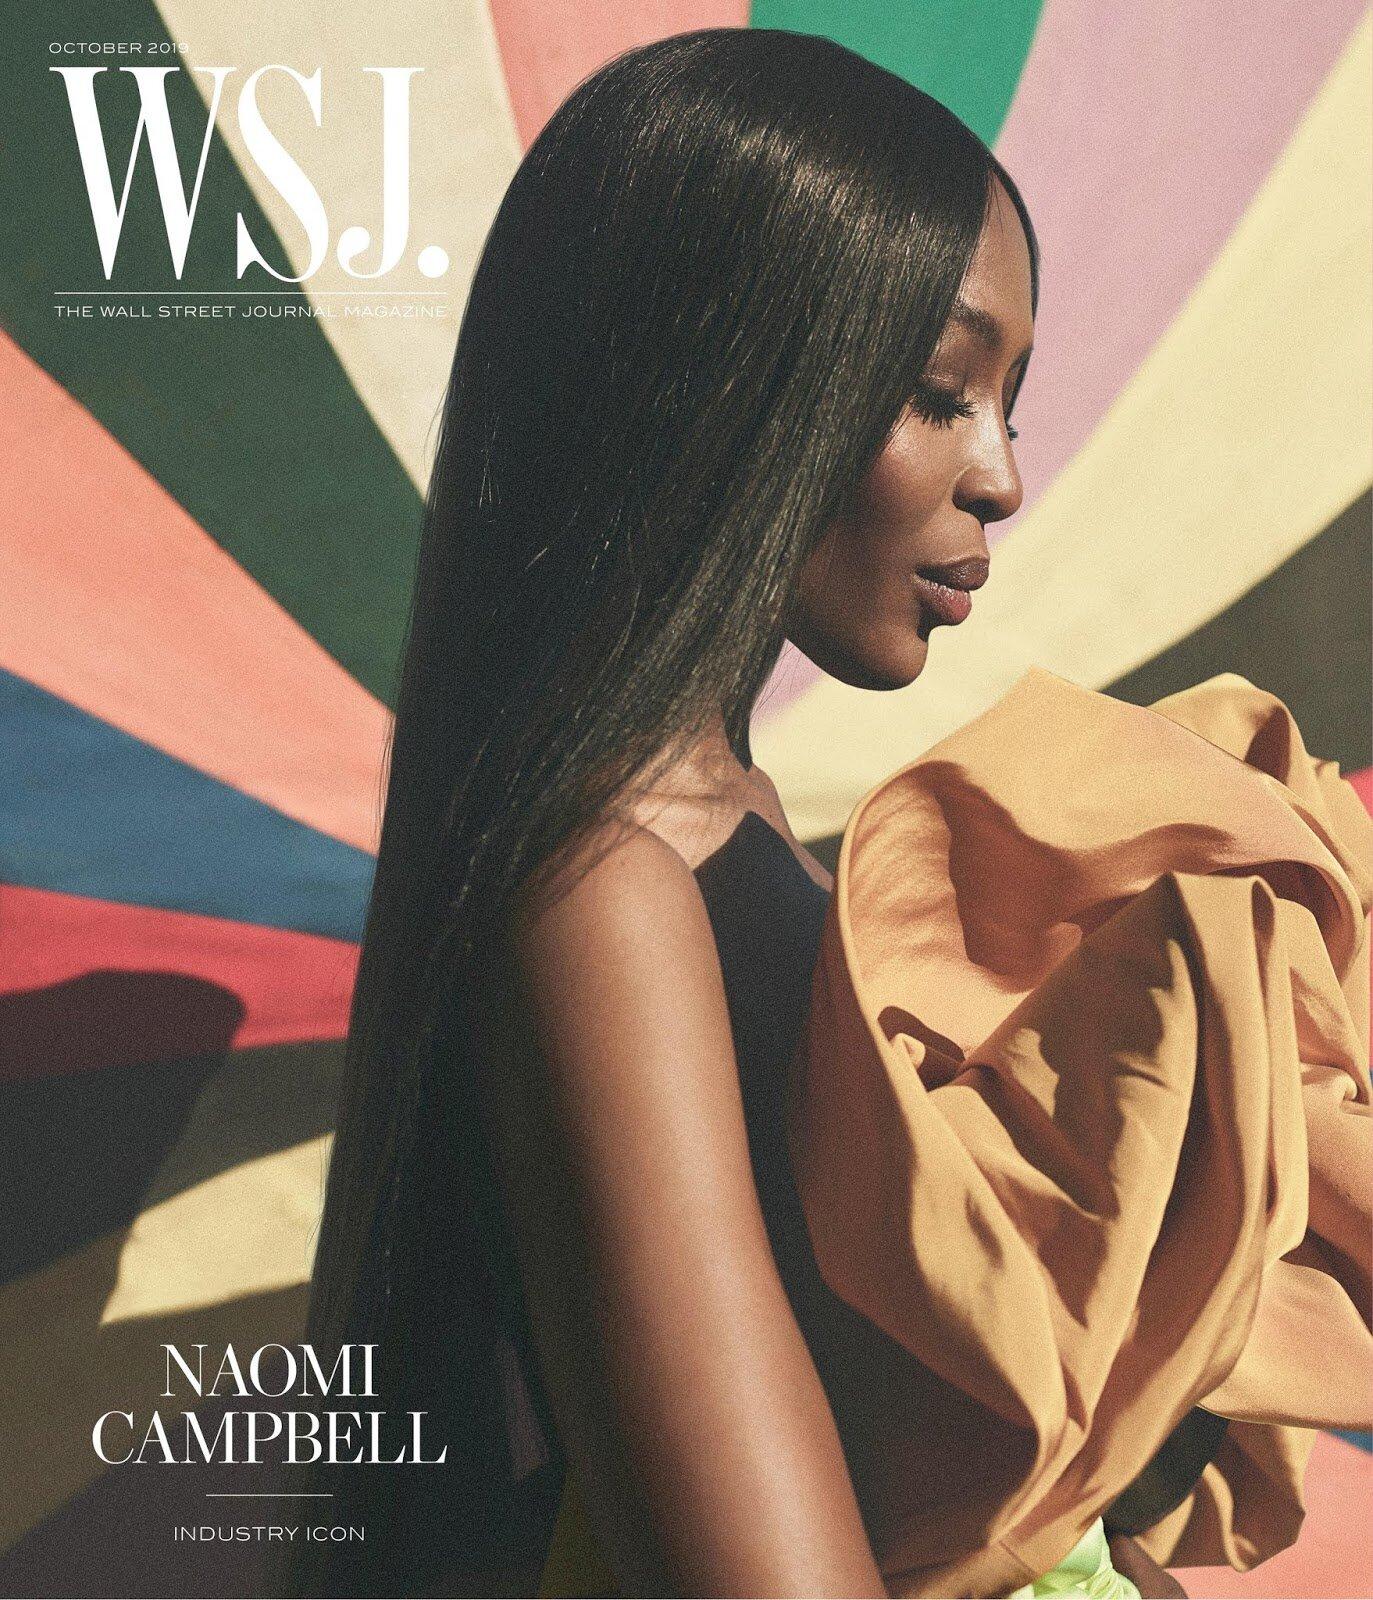 Naomi Campbell by Annemarieke van Drimmelen for WSJ Magazine Oct (2).jpg